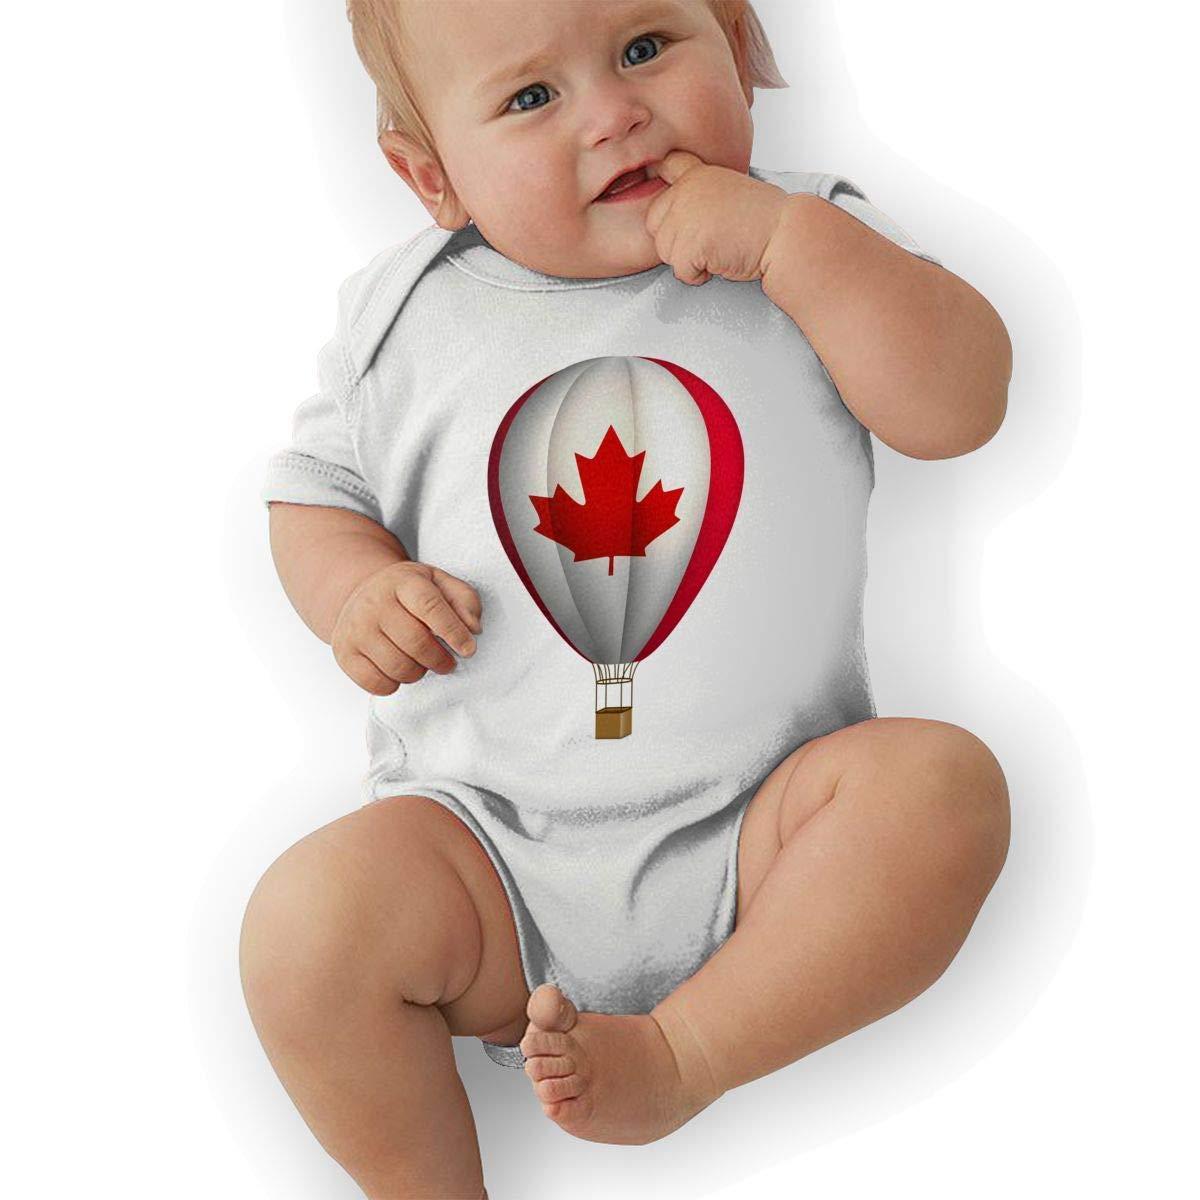 Newborn Baby Boys Bodysuit Short-Sleeve Onesie Hot Air Balloon Print Outfit Autumn Pajamas